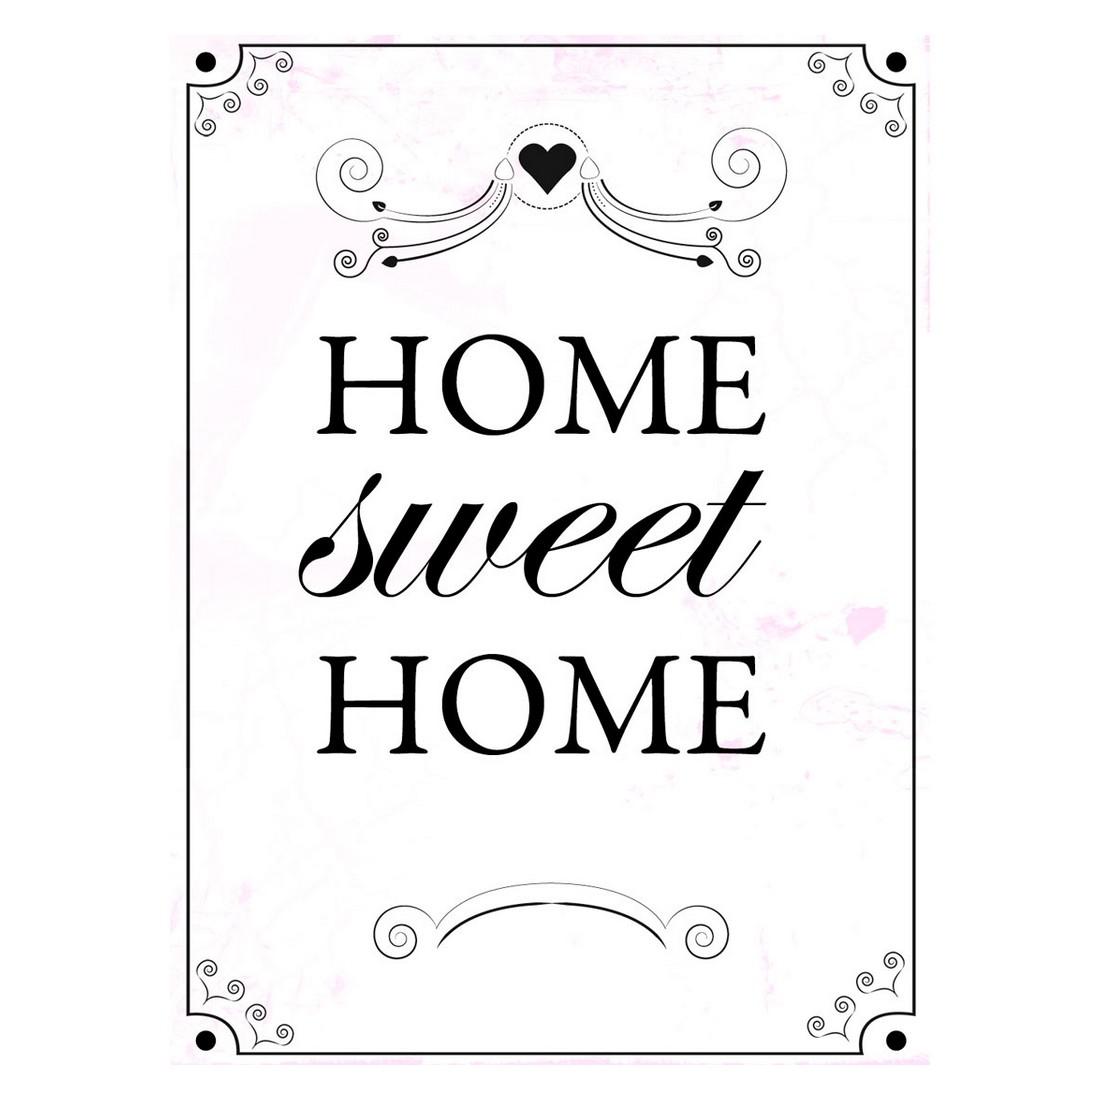 Ölgemälde Home sweet home I – Größe 40 x 30 cm, yourPainting günstig kaufen